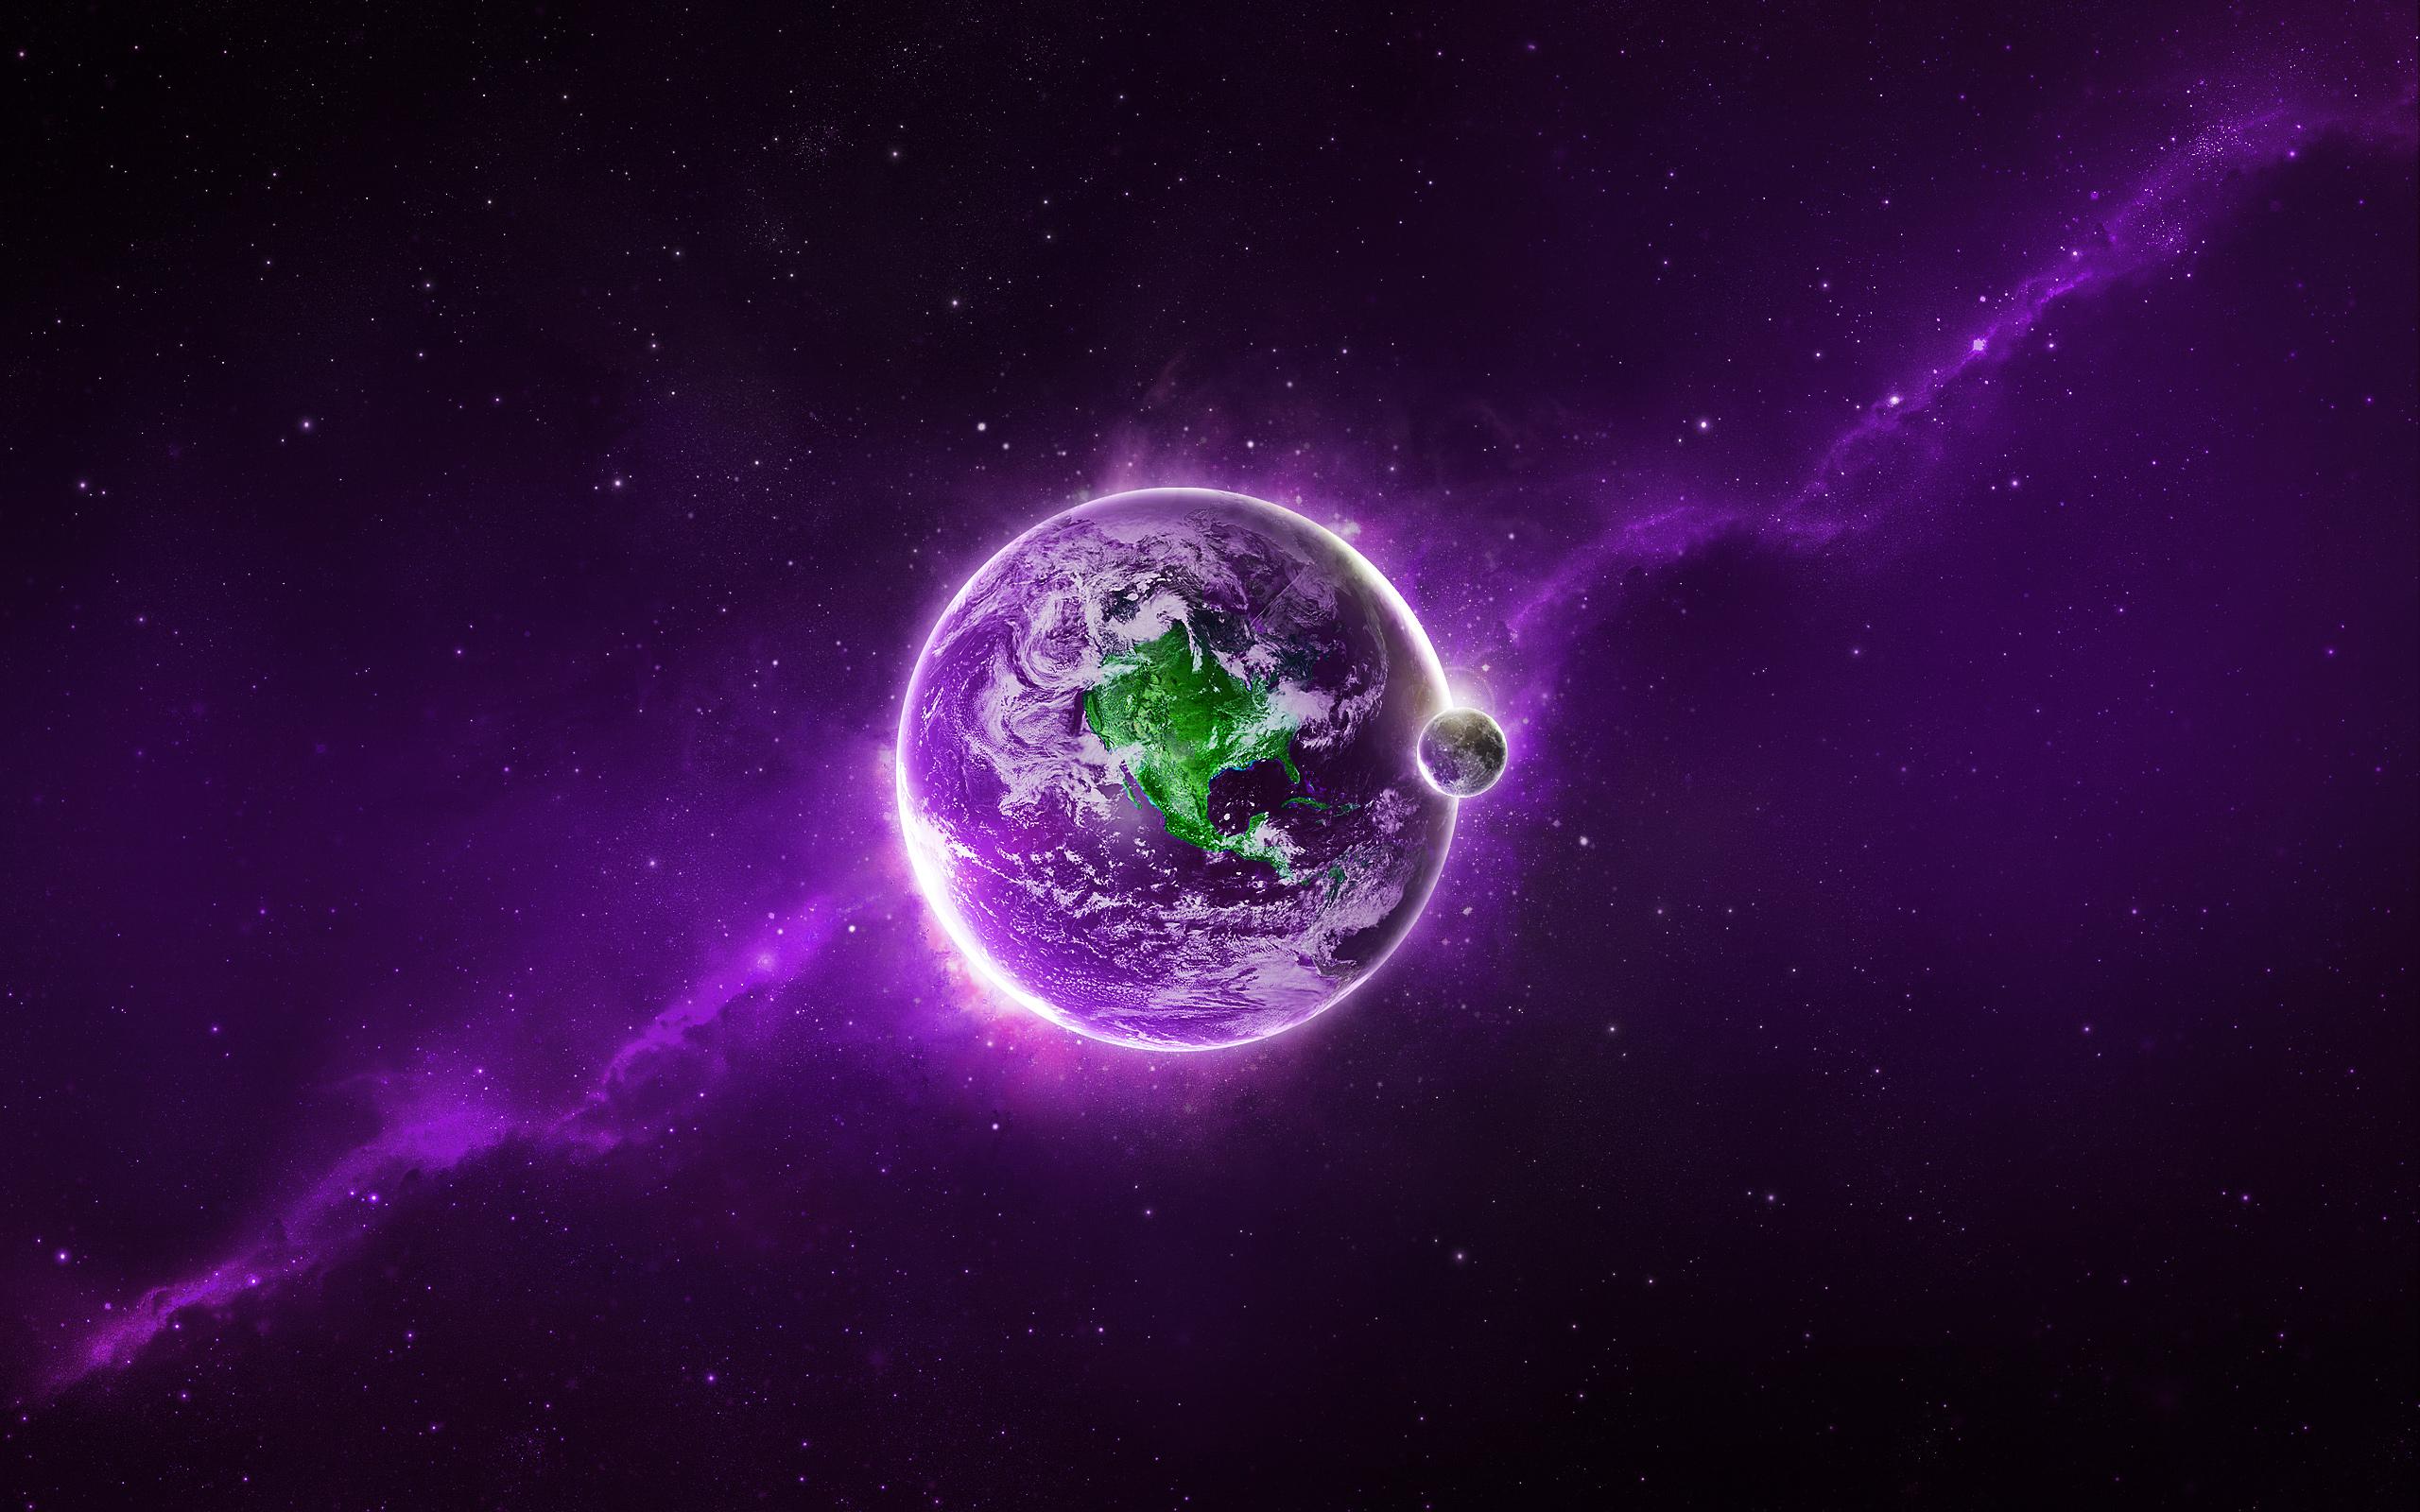 Purple Earth Wallpapers HD Wallpapers 2560x1600